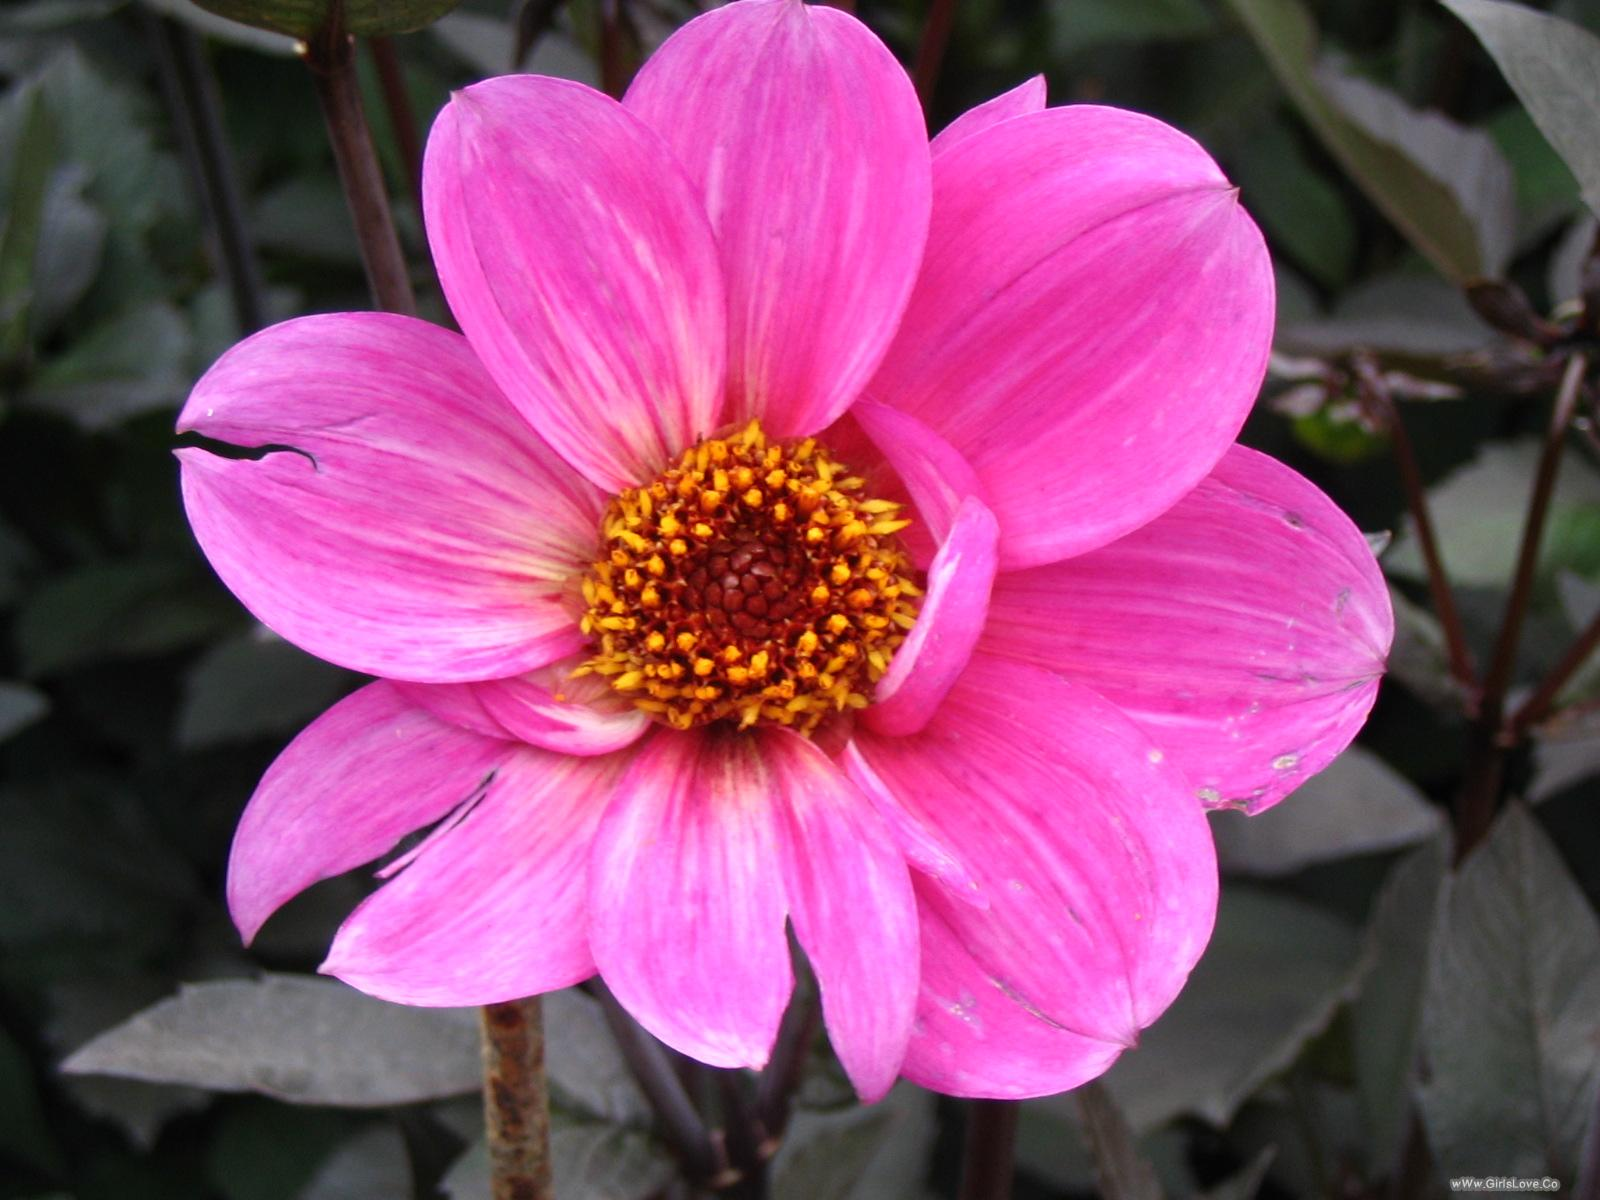 بالصور صورة زهور وورود بريه 20160701 2233